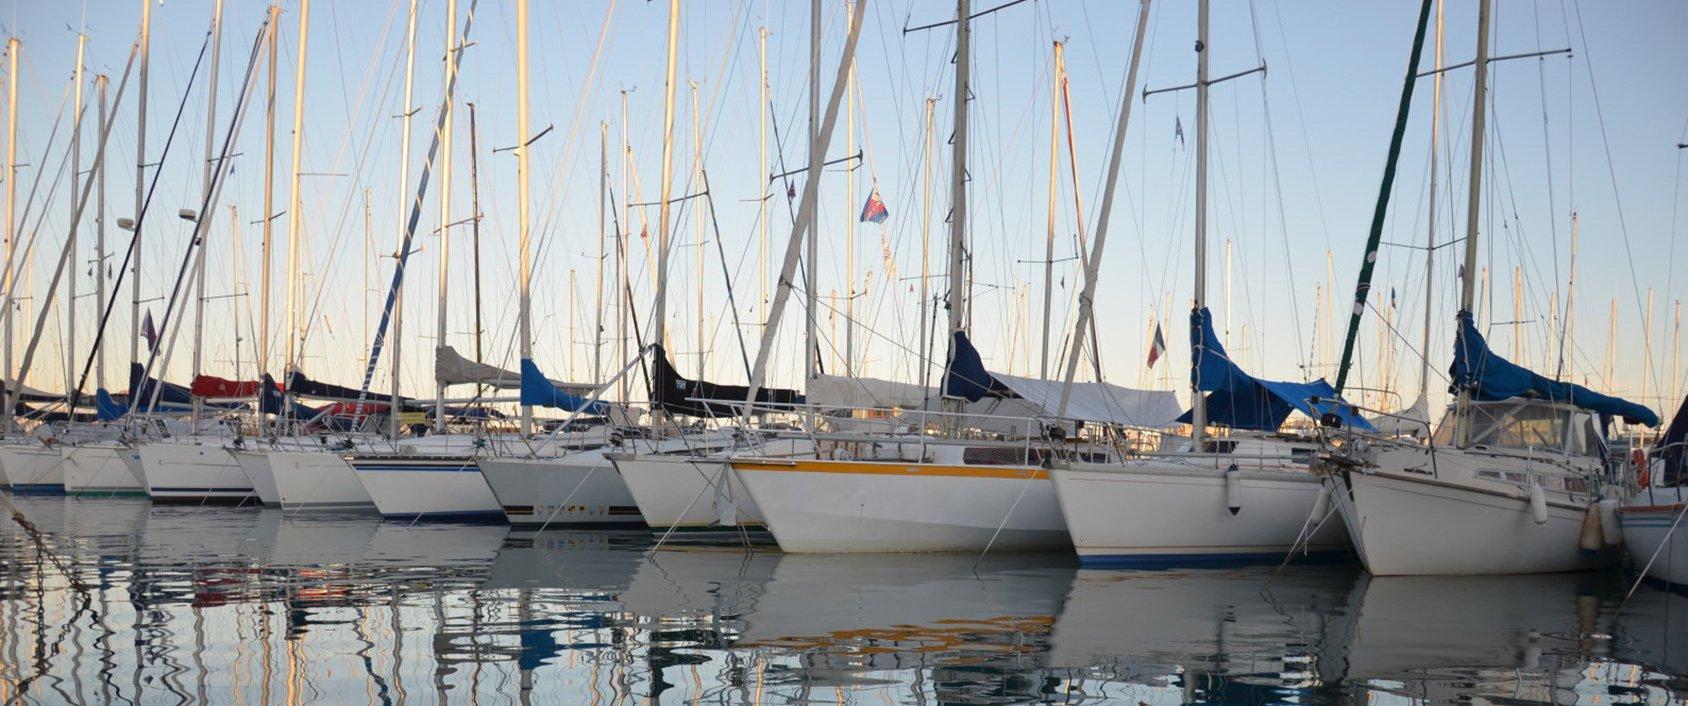 Outbound Sailing - Lake Travis Sailboat Charter Club